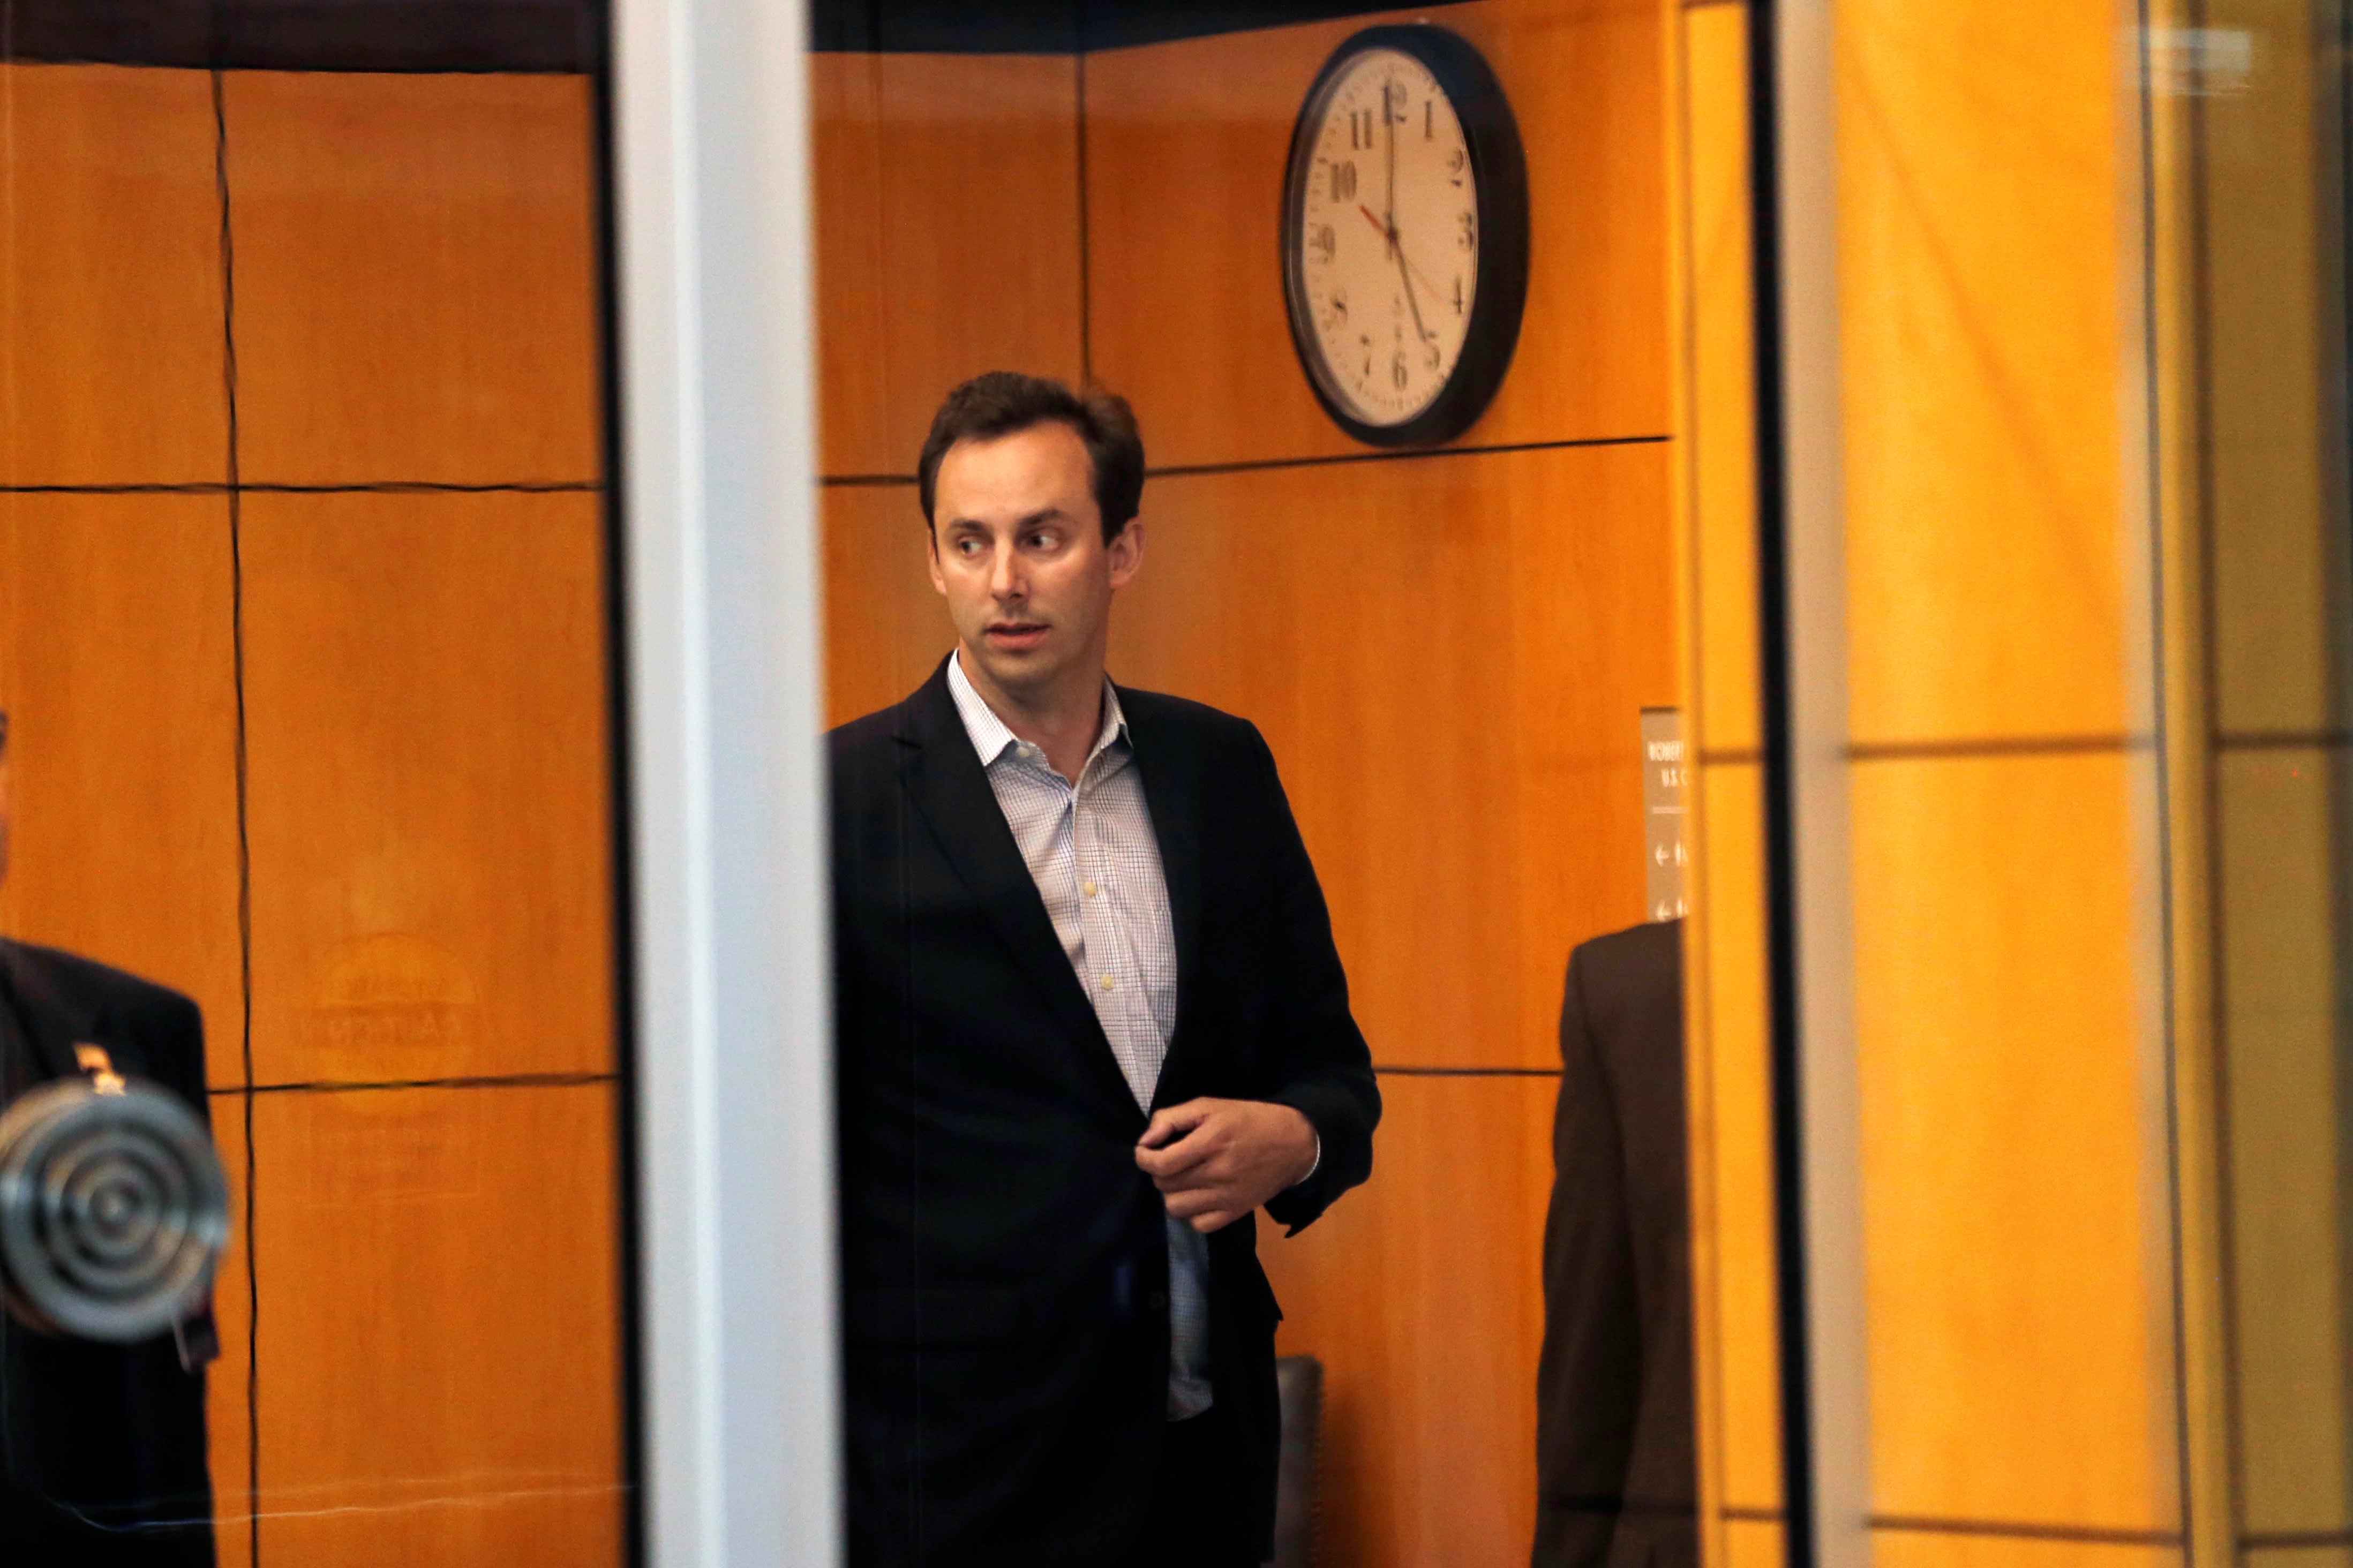 Trump pardons Anthony Levandowski, the engineer who stole self-driving car secrets from Google